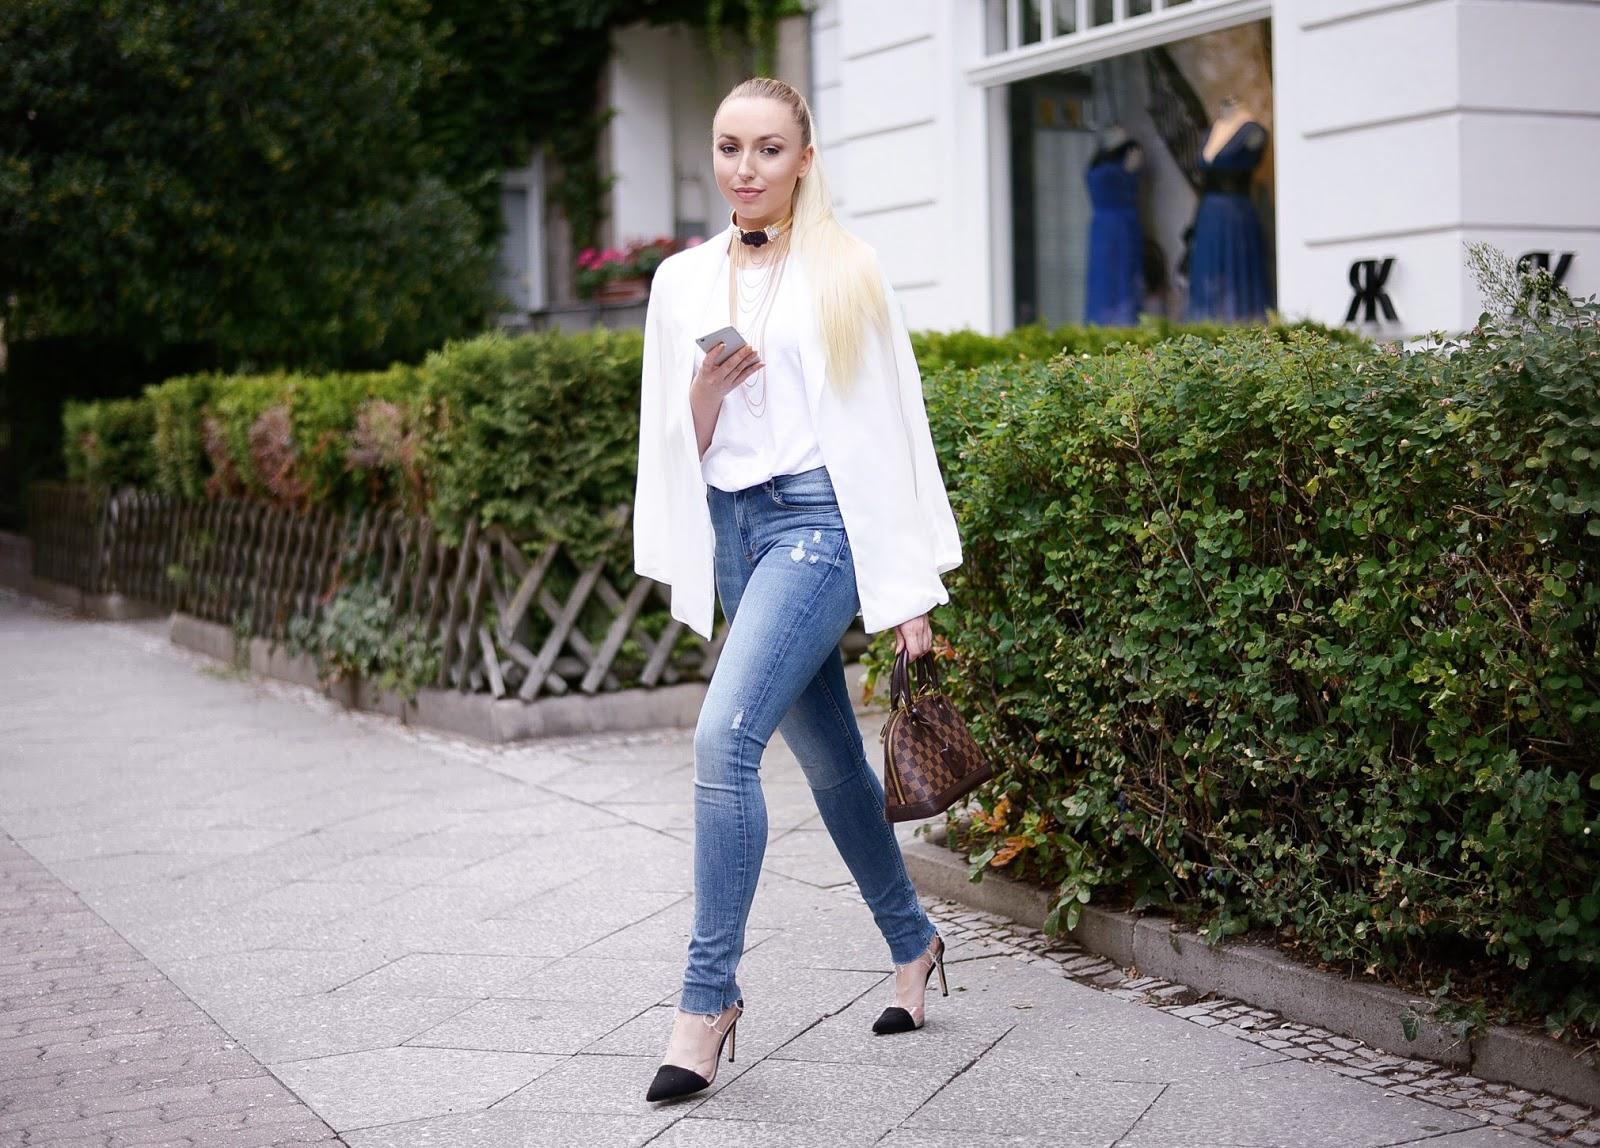 fashionblogger streetstyle inspiration